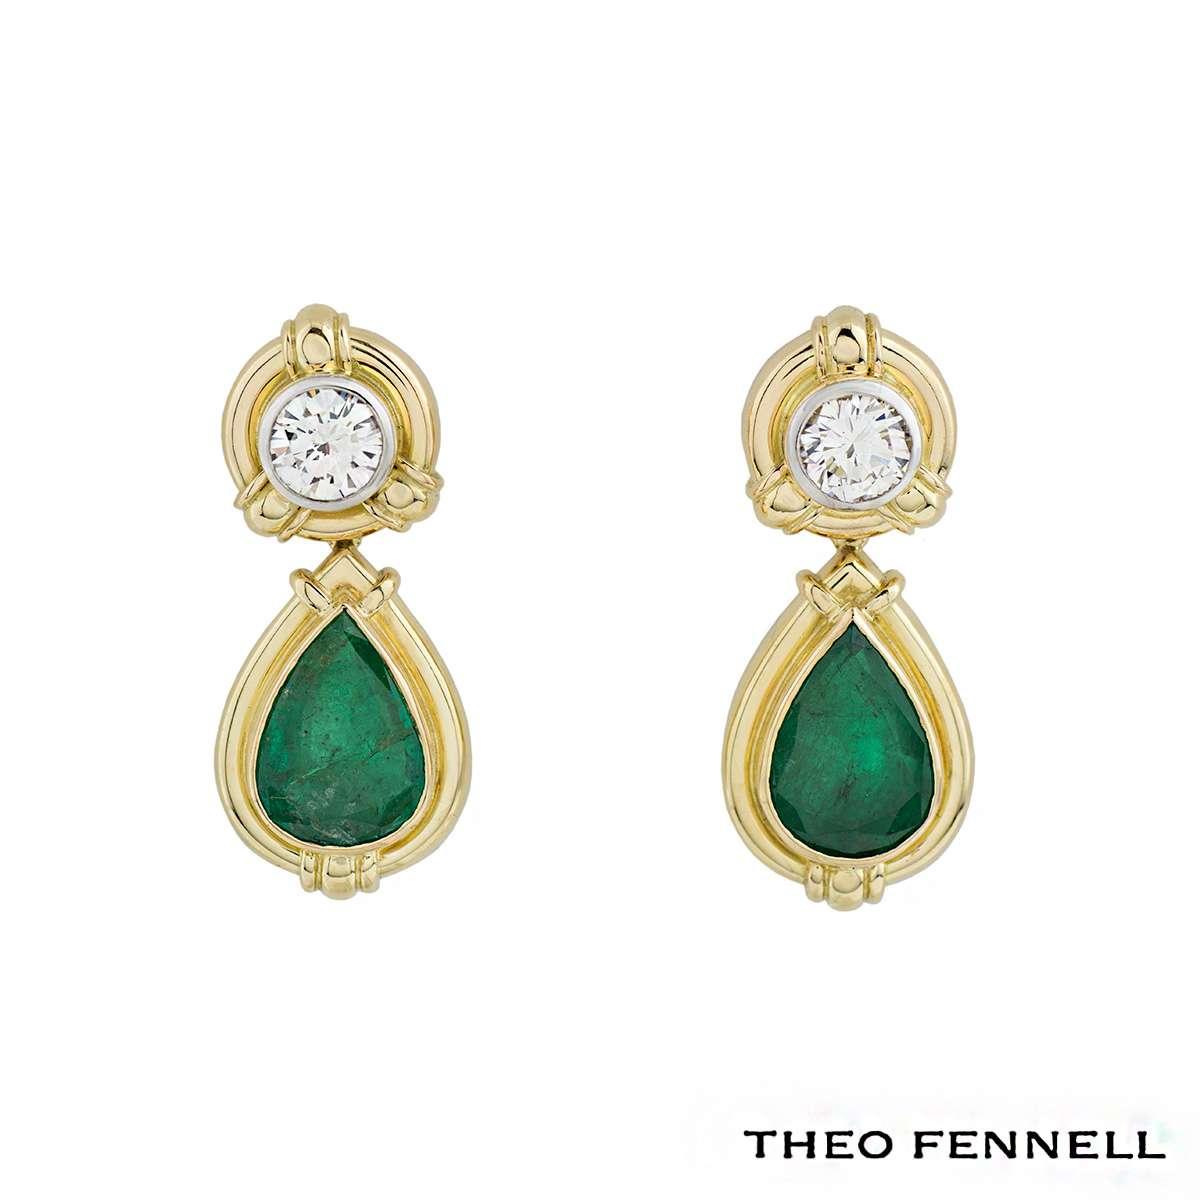 Theo Fennell Yellow Gold Diamond & Emerald Drop Earrings